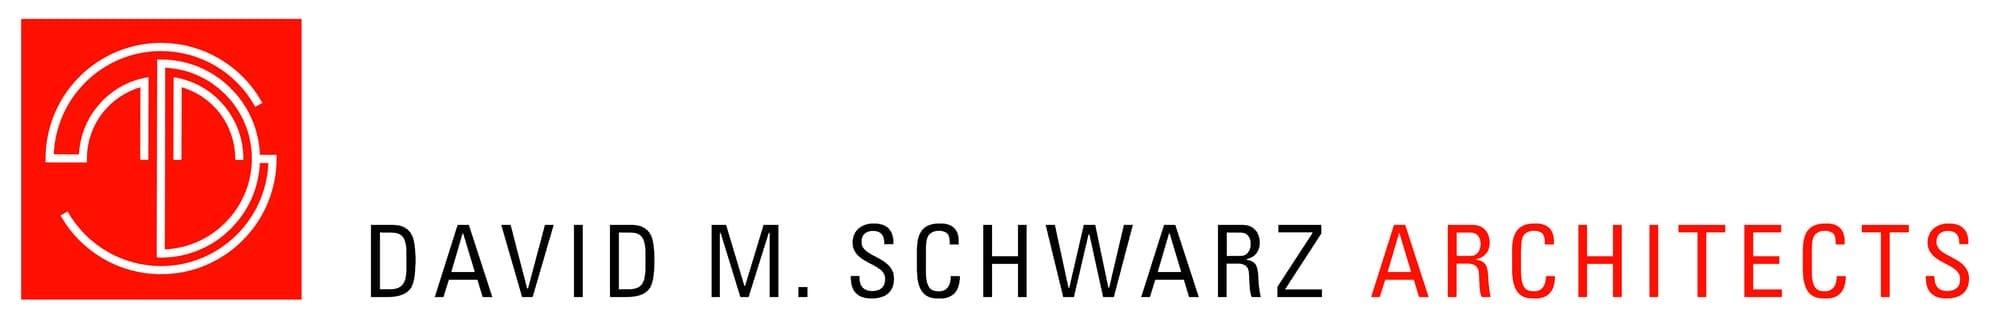 David M Schwarz Architects